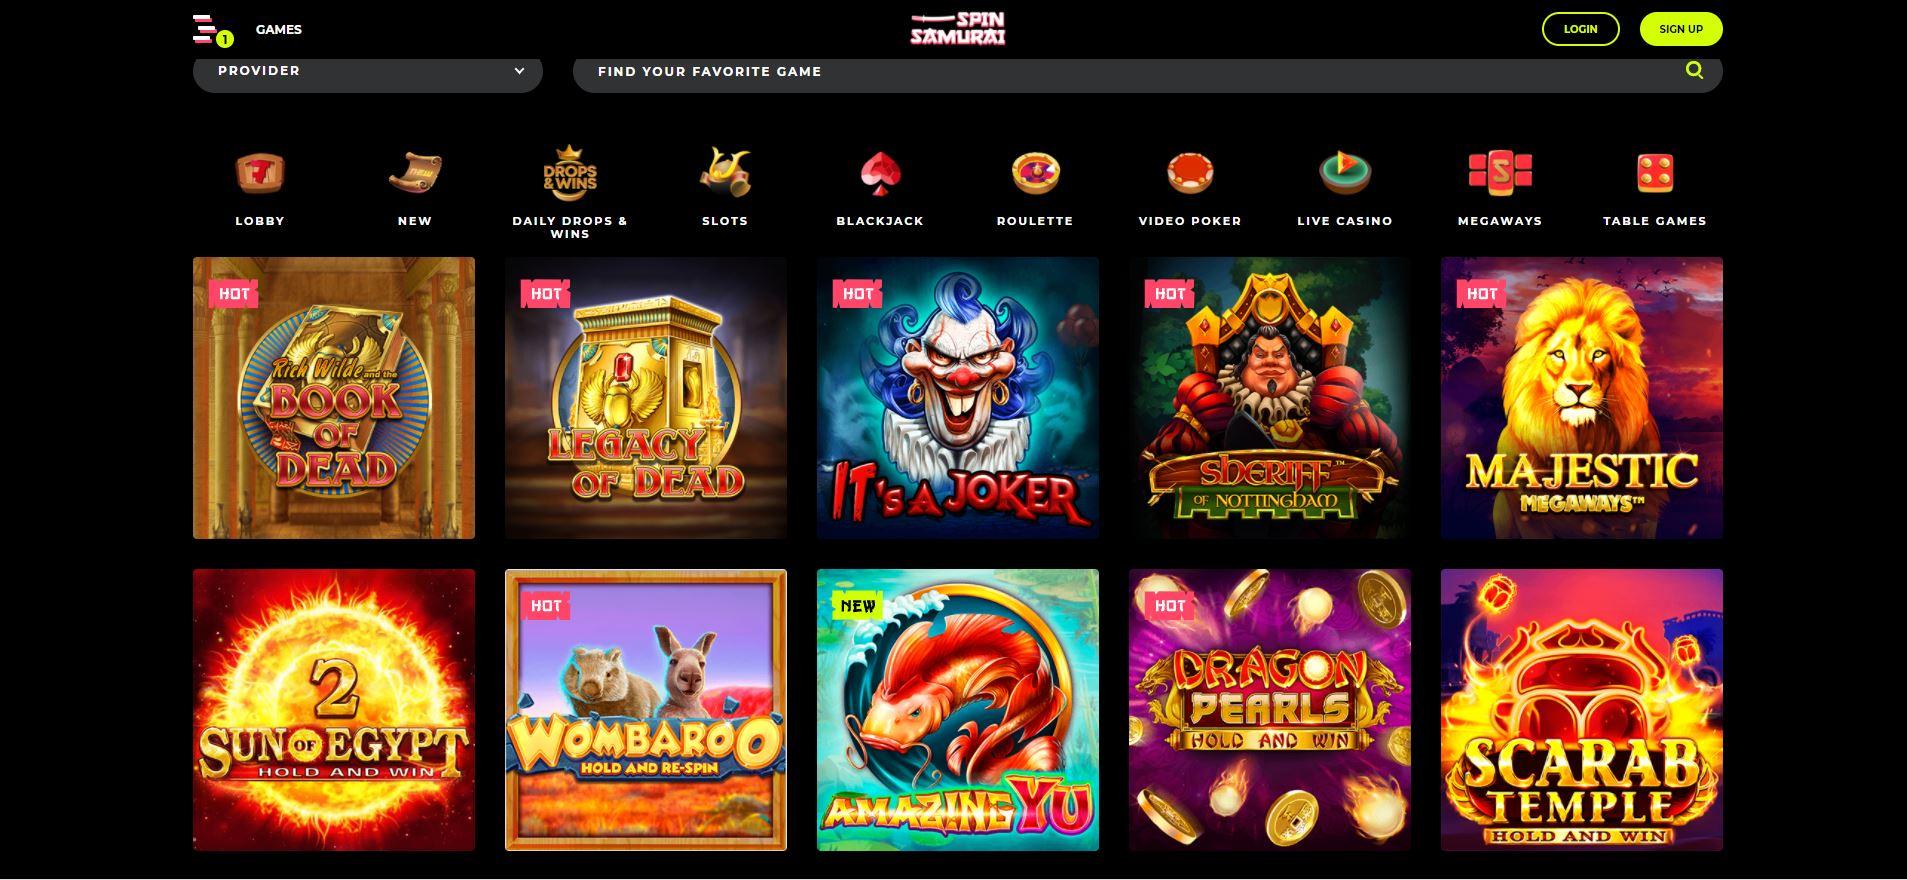 Spin Samurai Casino Games Screenshot